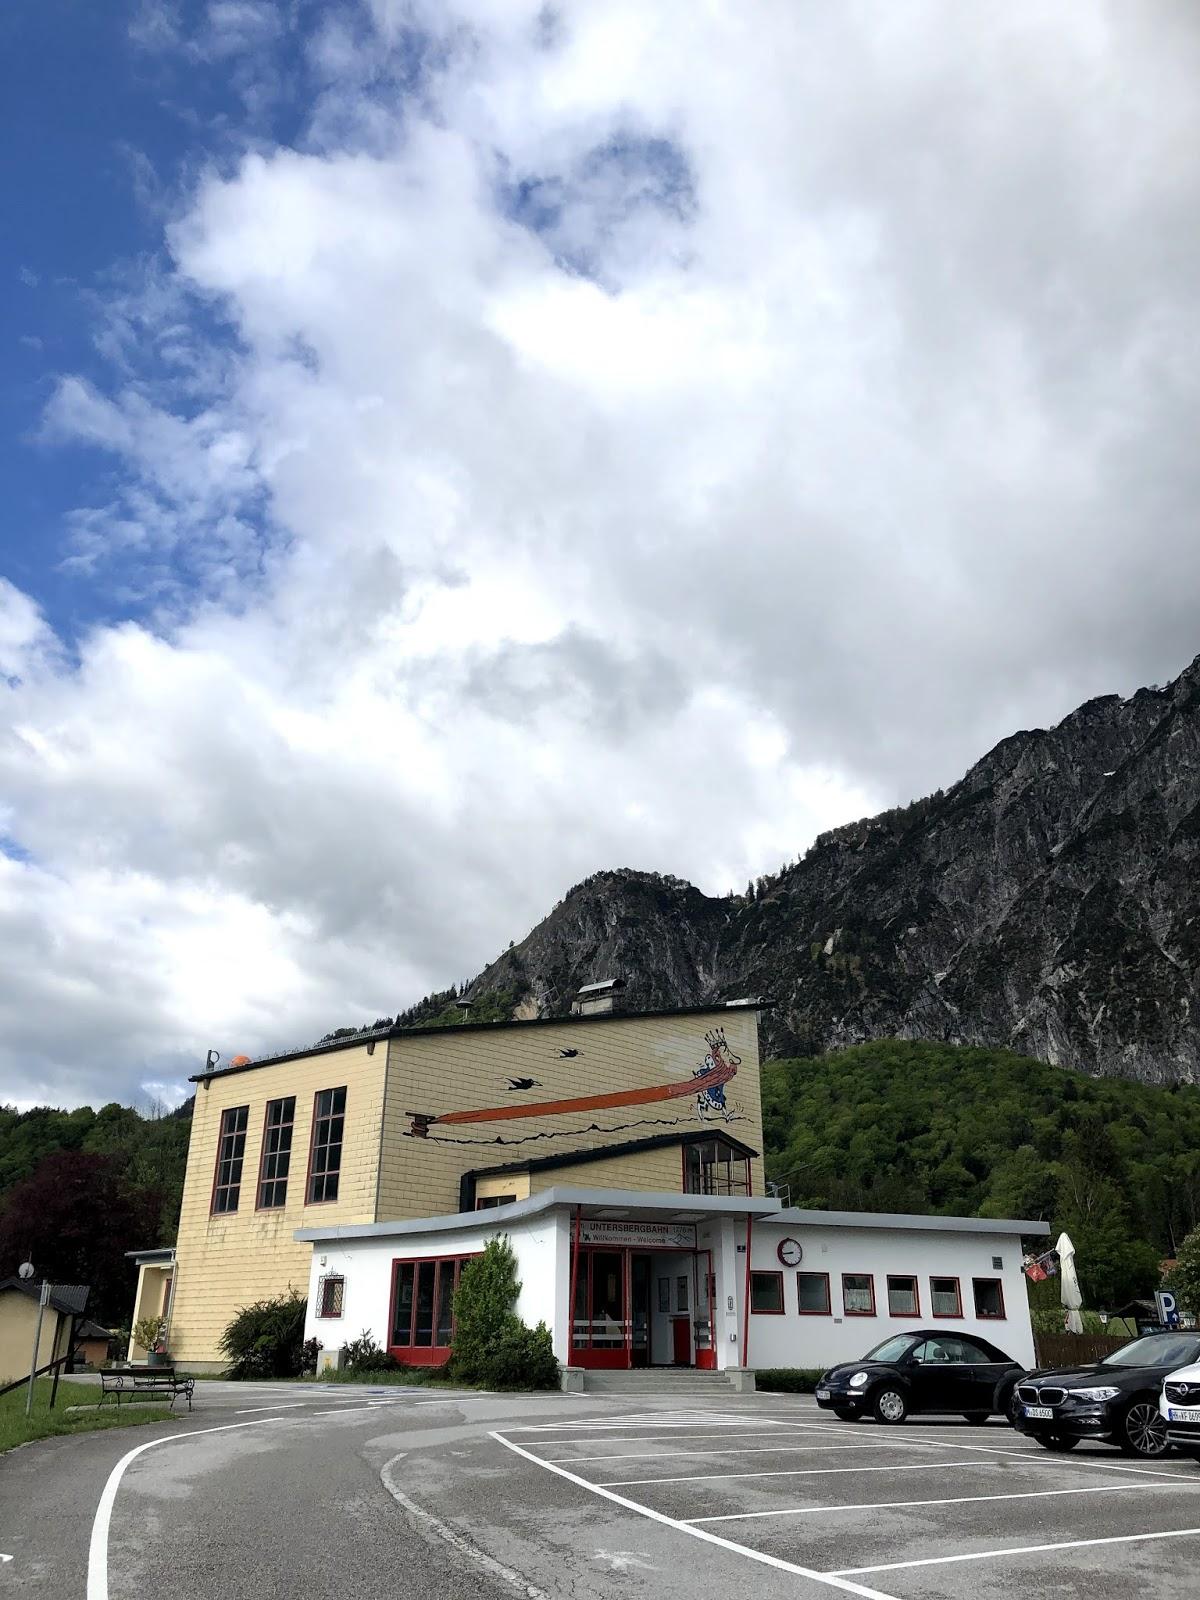 Salzburg Itinerary Untersbergbahn Moutain Cable Car